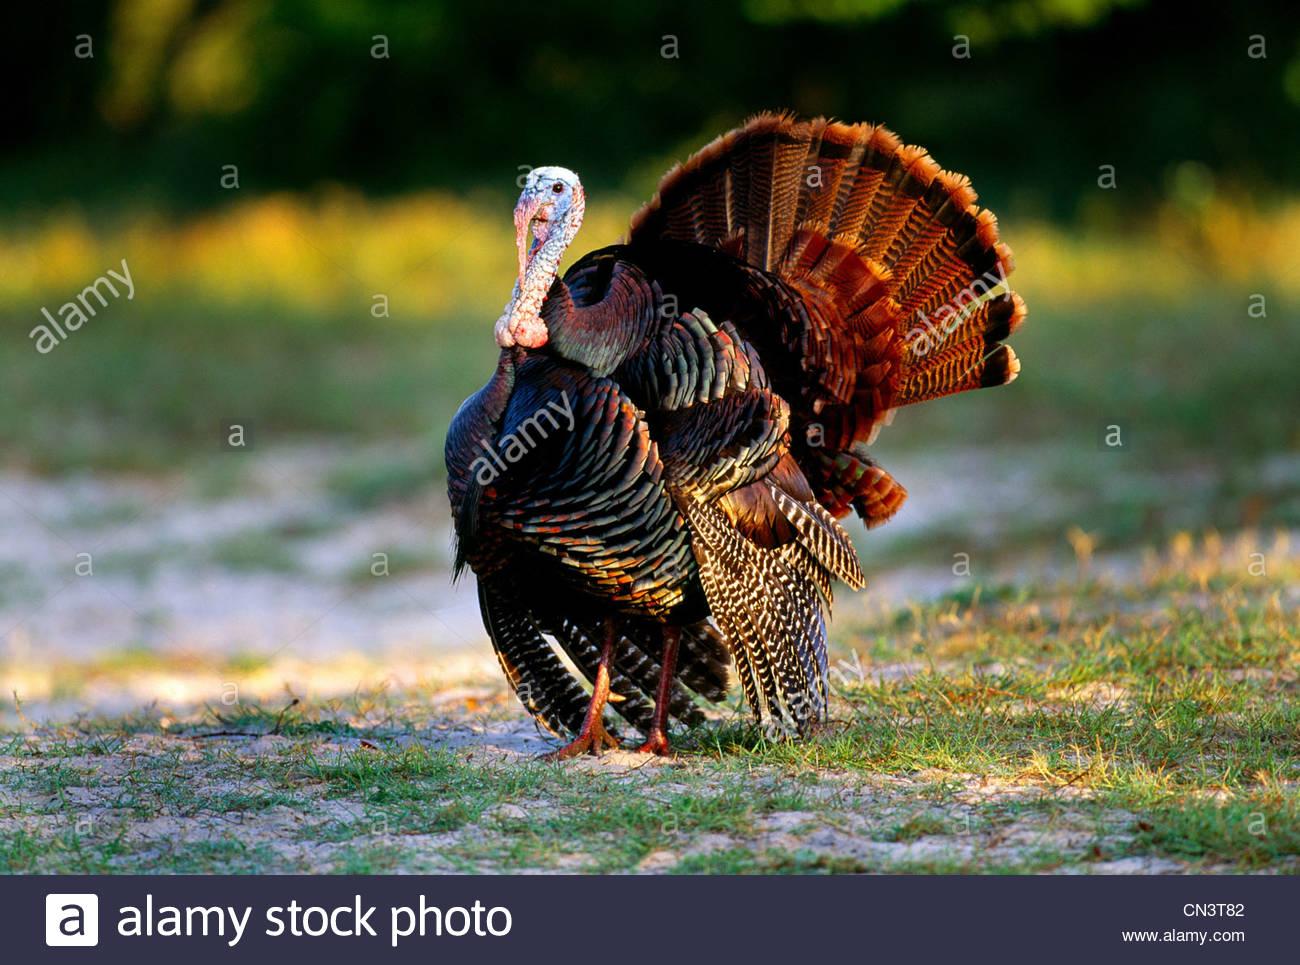 Wild turkey, Cumberland Island National Seashore, Georgia - Stock Image